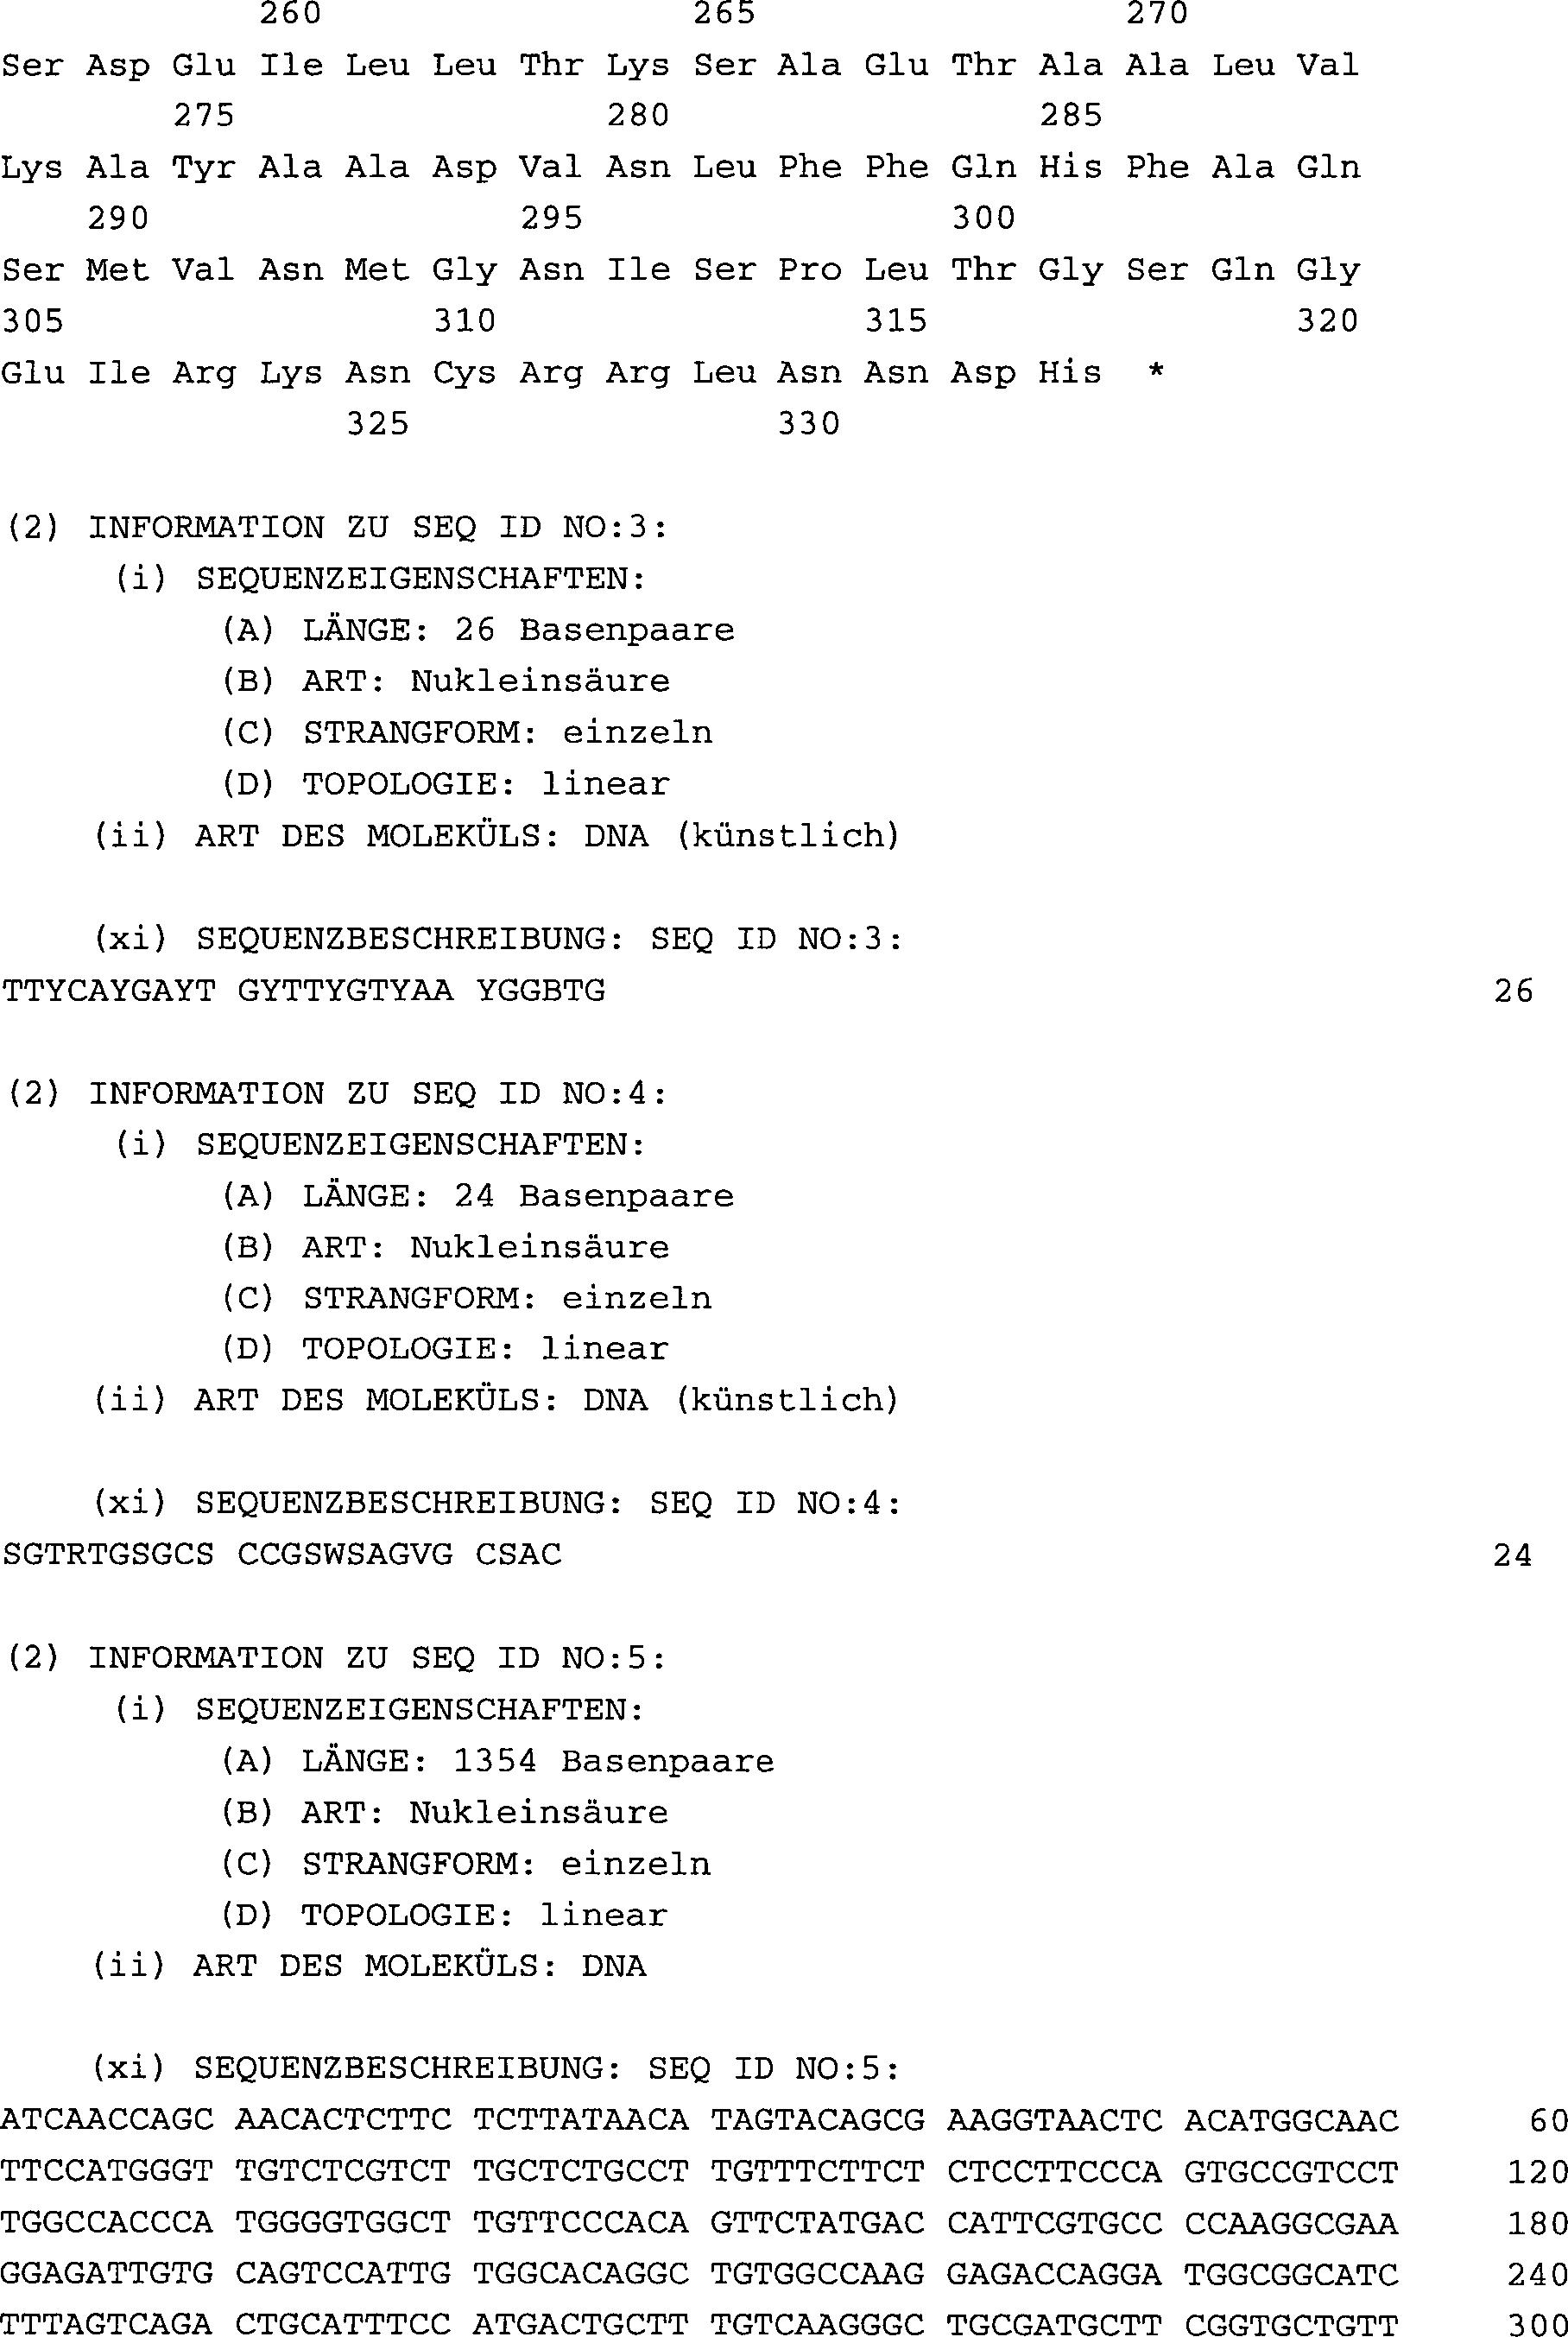 Figure 01180001